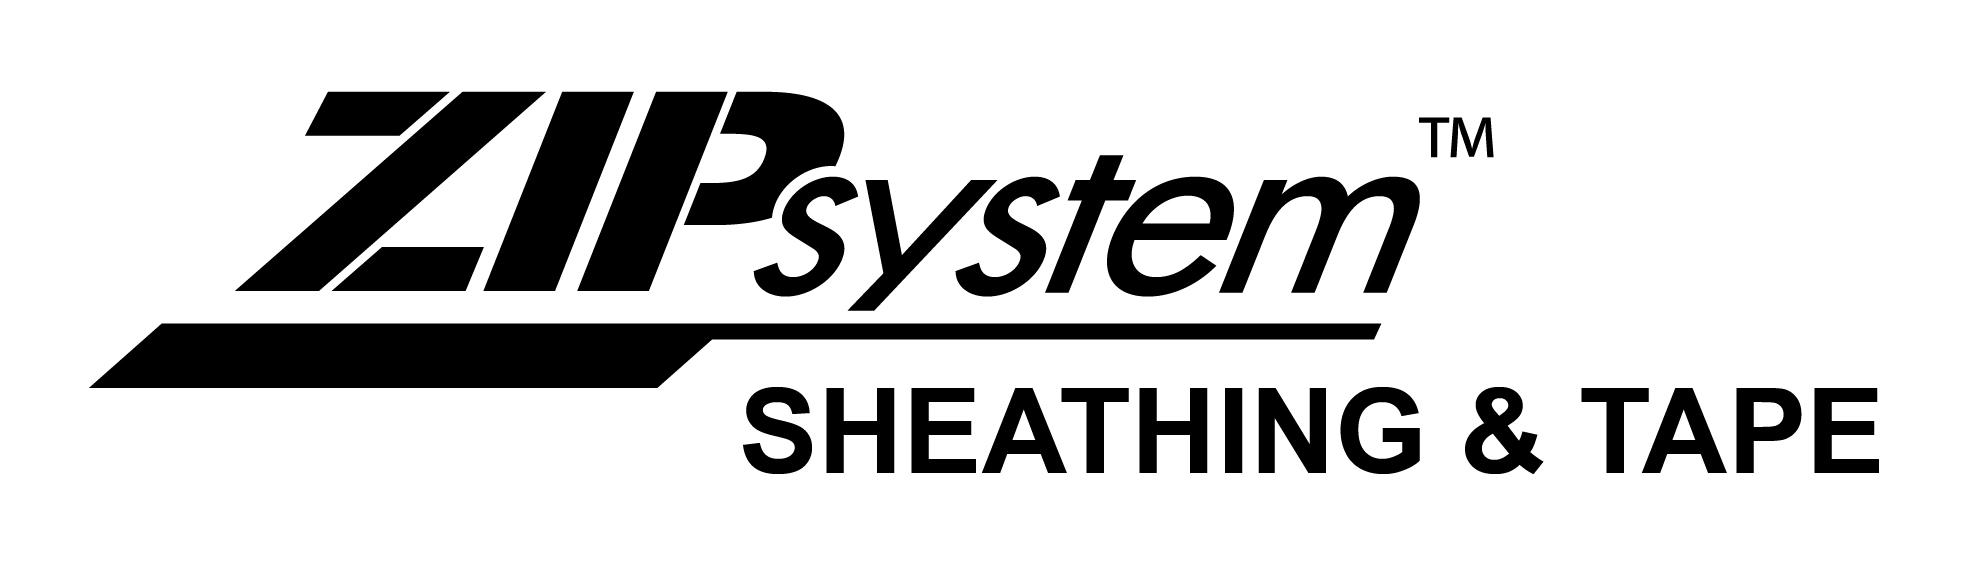 Zip System Logo